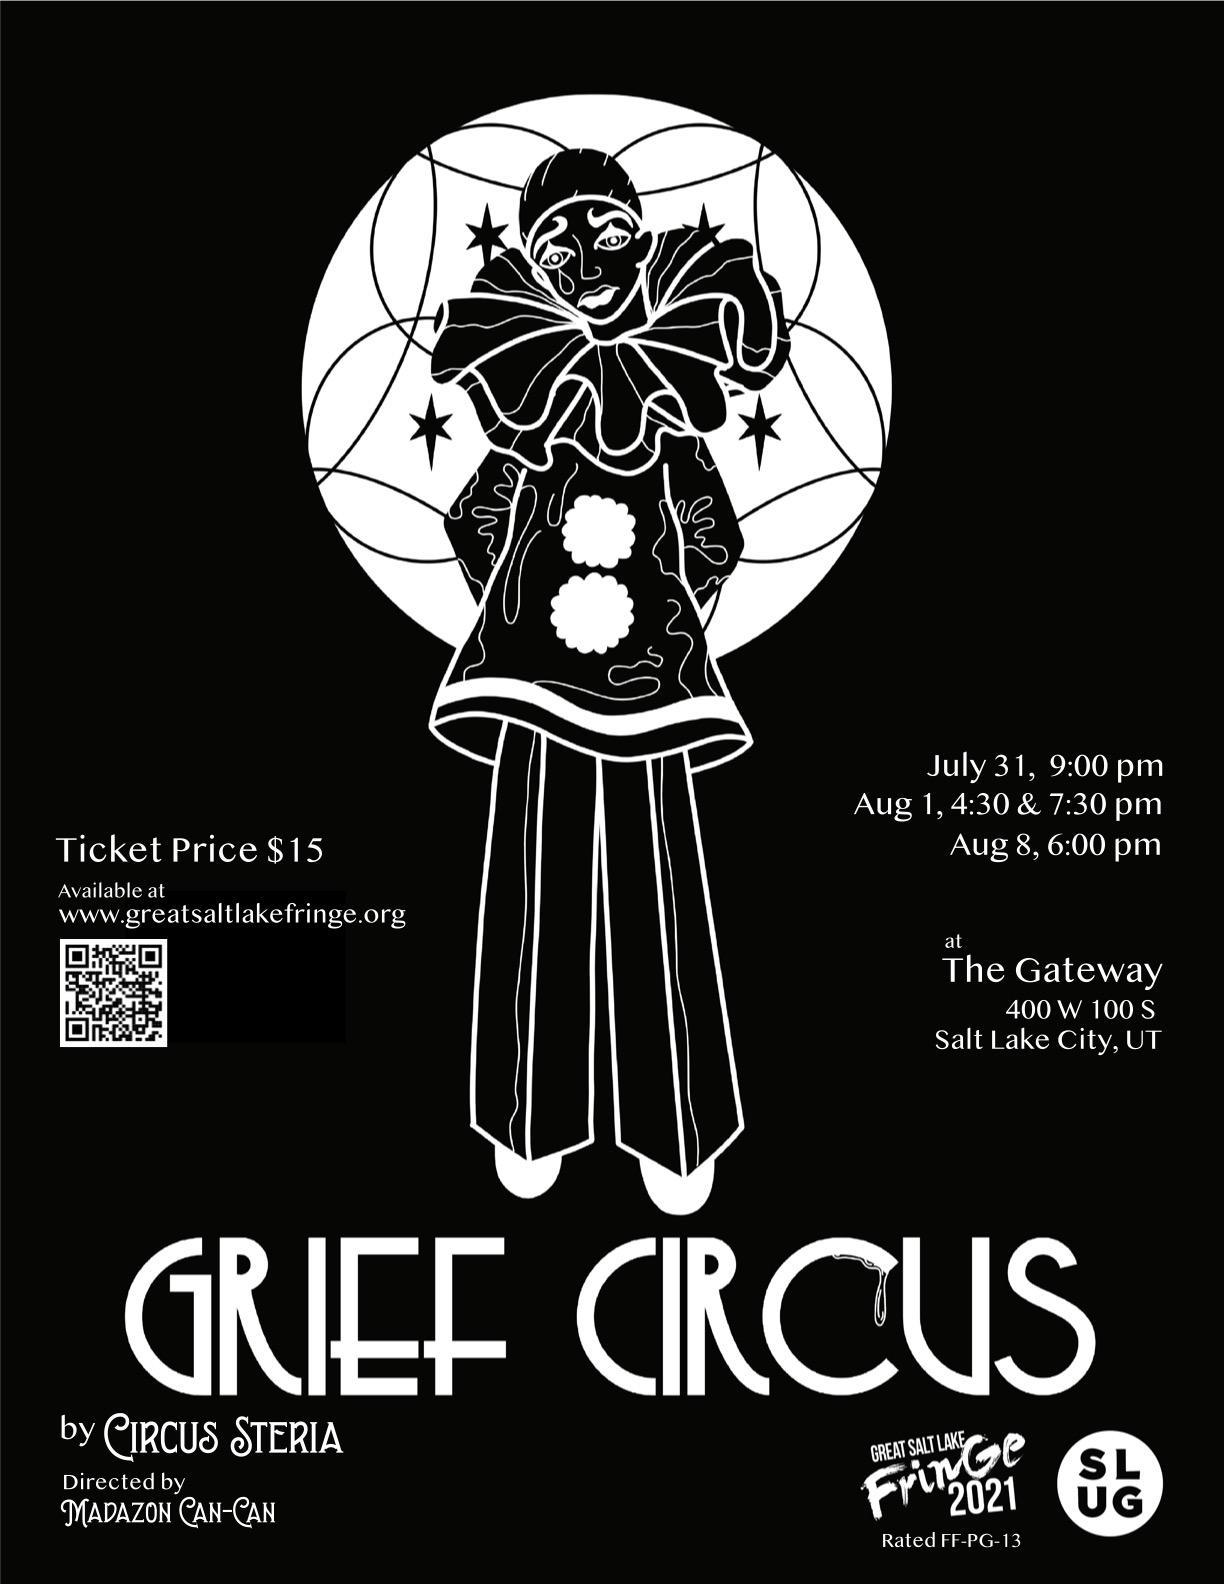 Circus Steria Presents: Grief Circus